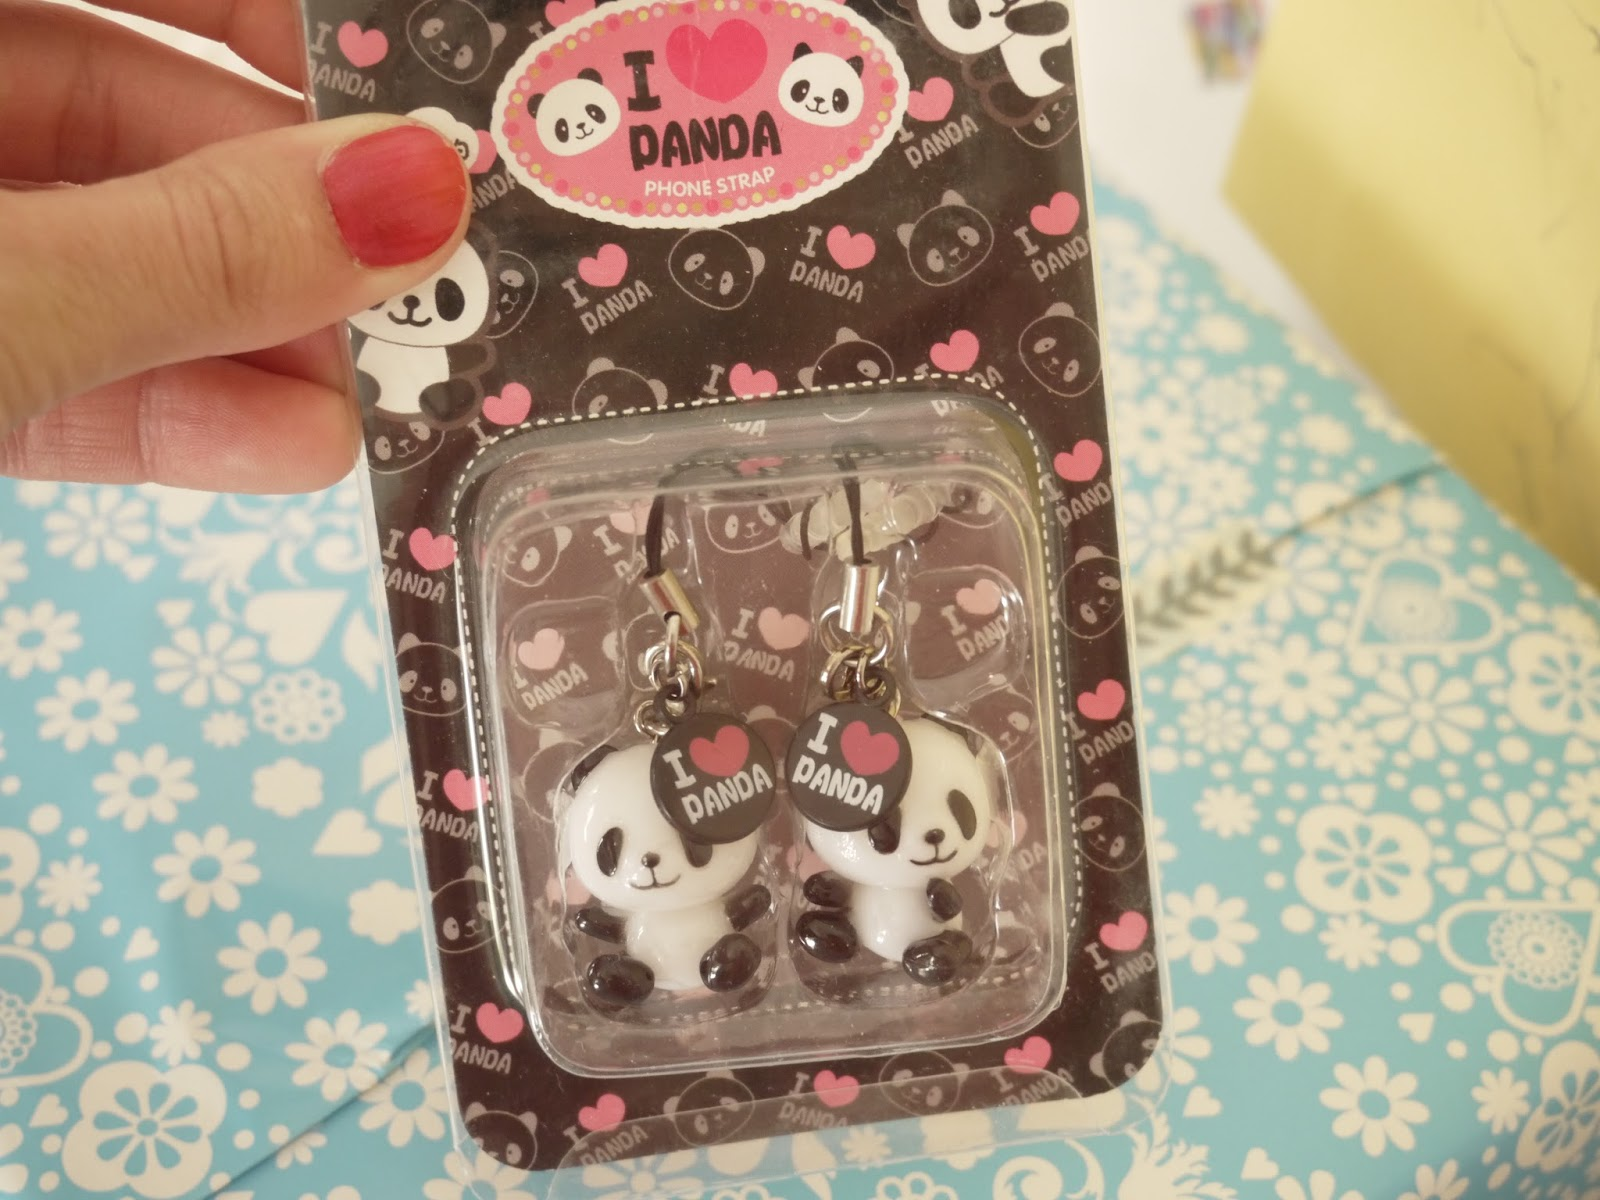 panda phone strap